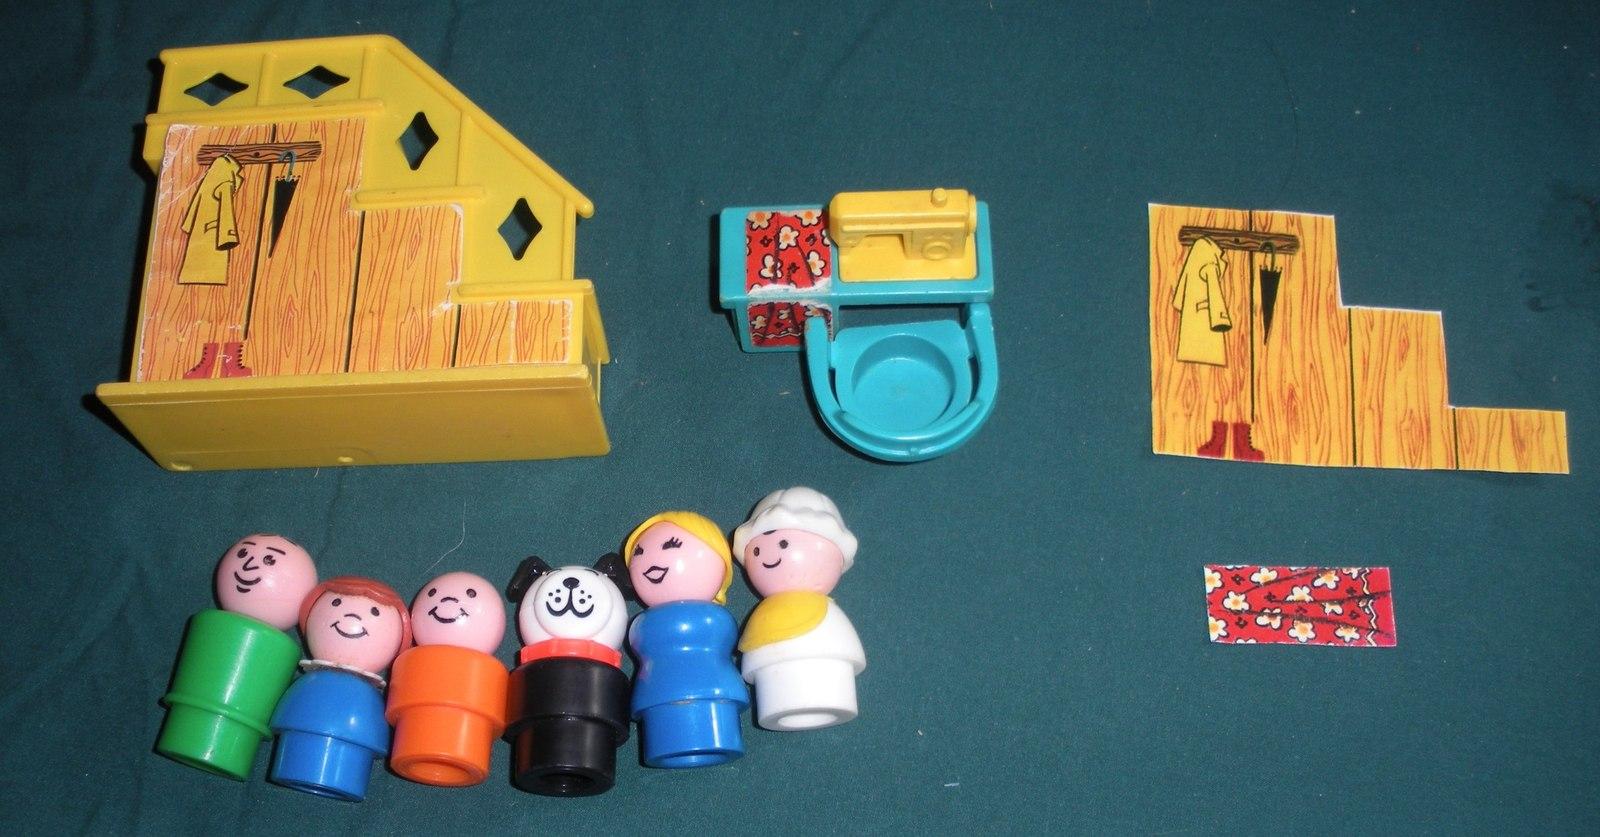 Vtg. Fisher Price Little People #952 Yellow House Comp.+ BONUS/ EXC++-NR MT  (P) image 2